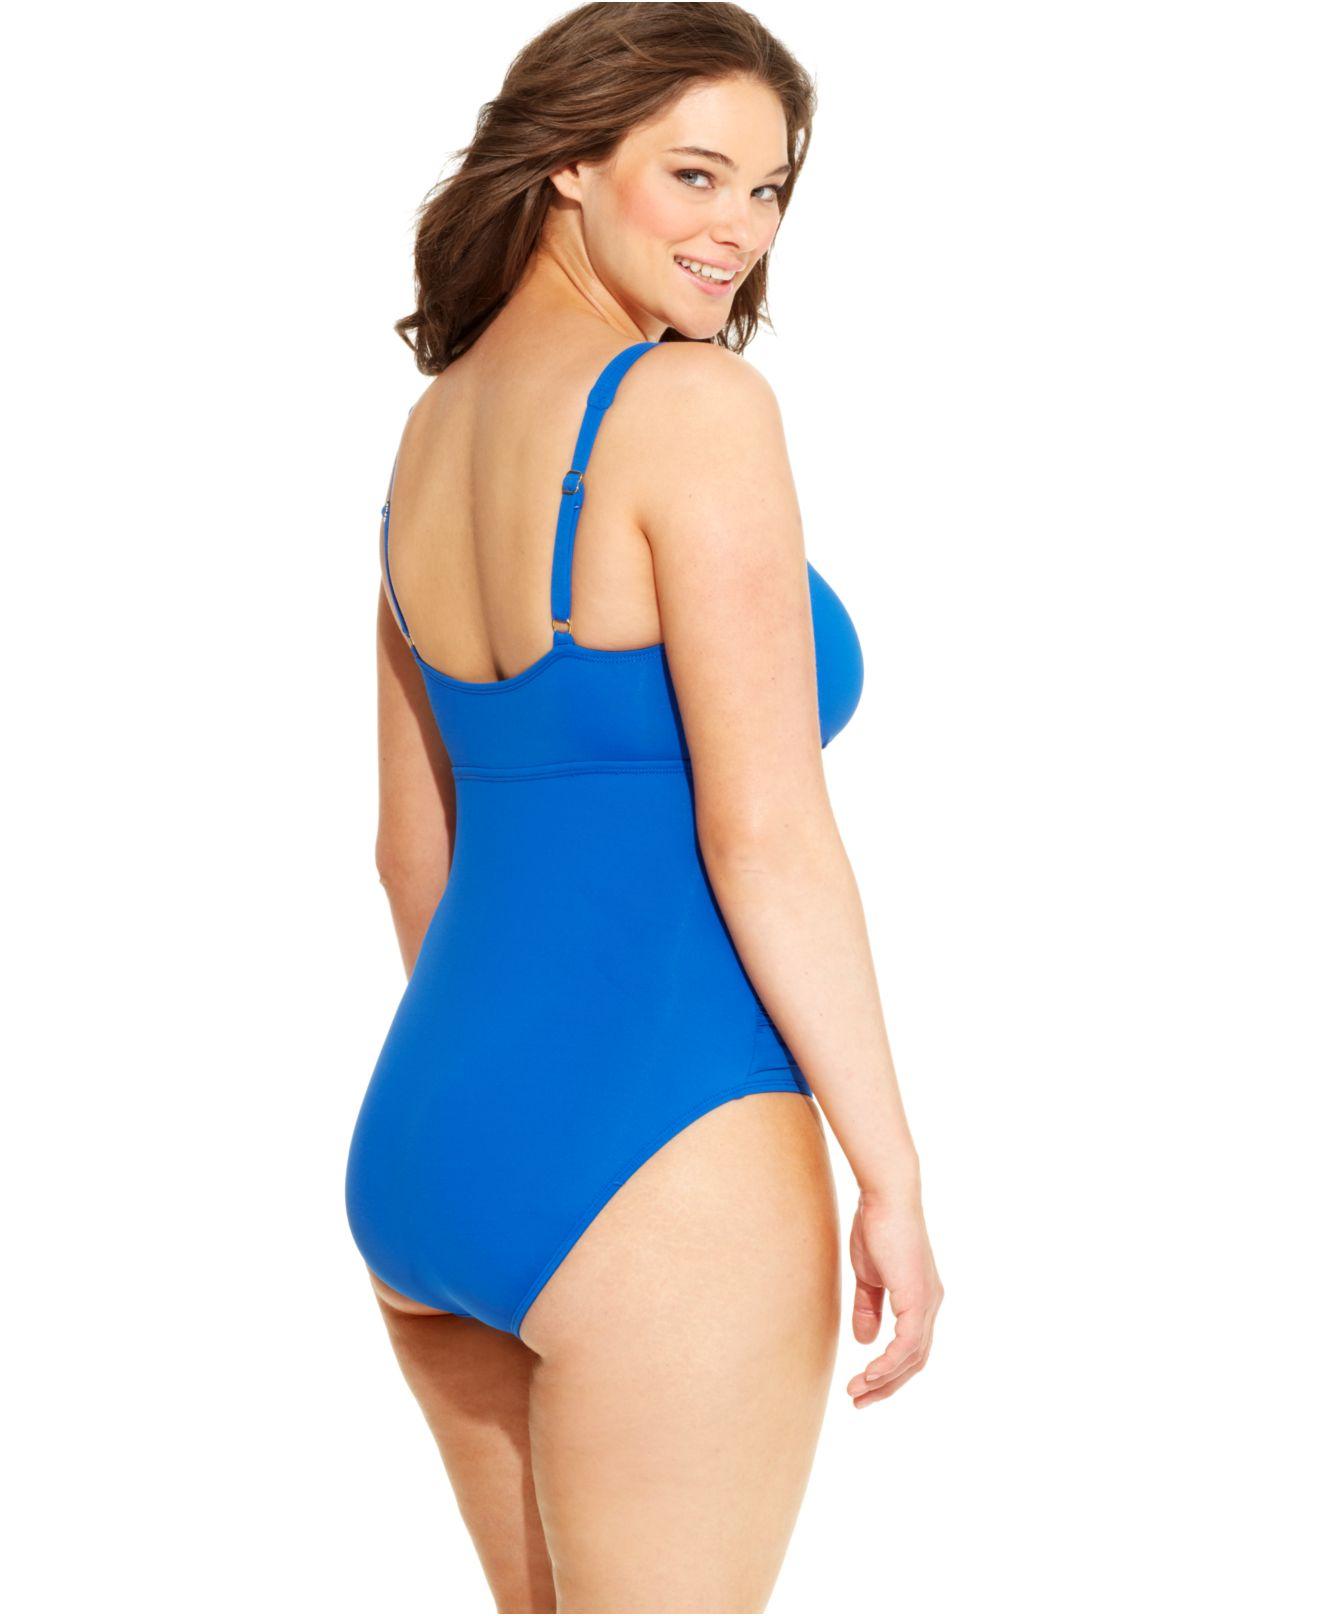 45d2d910b01 Lauren by Ralph Lauren Plus-Size Twist-Front One-Piece Swimsuit in ...